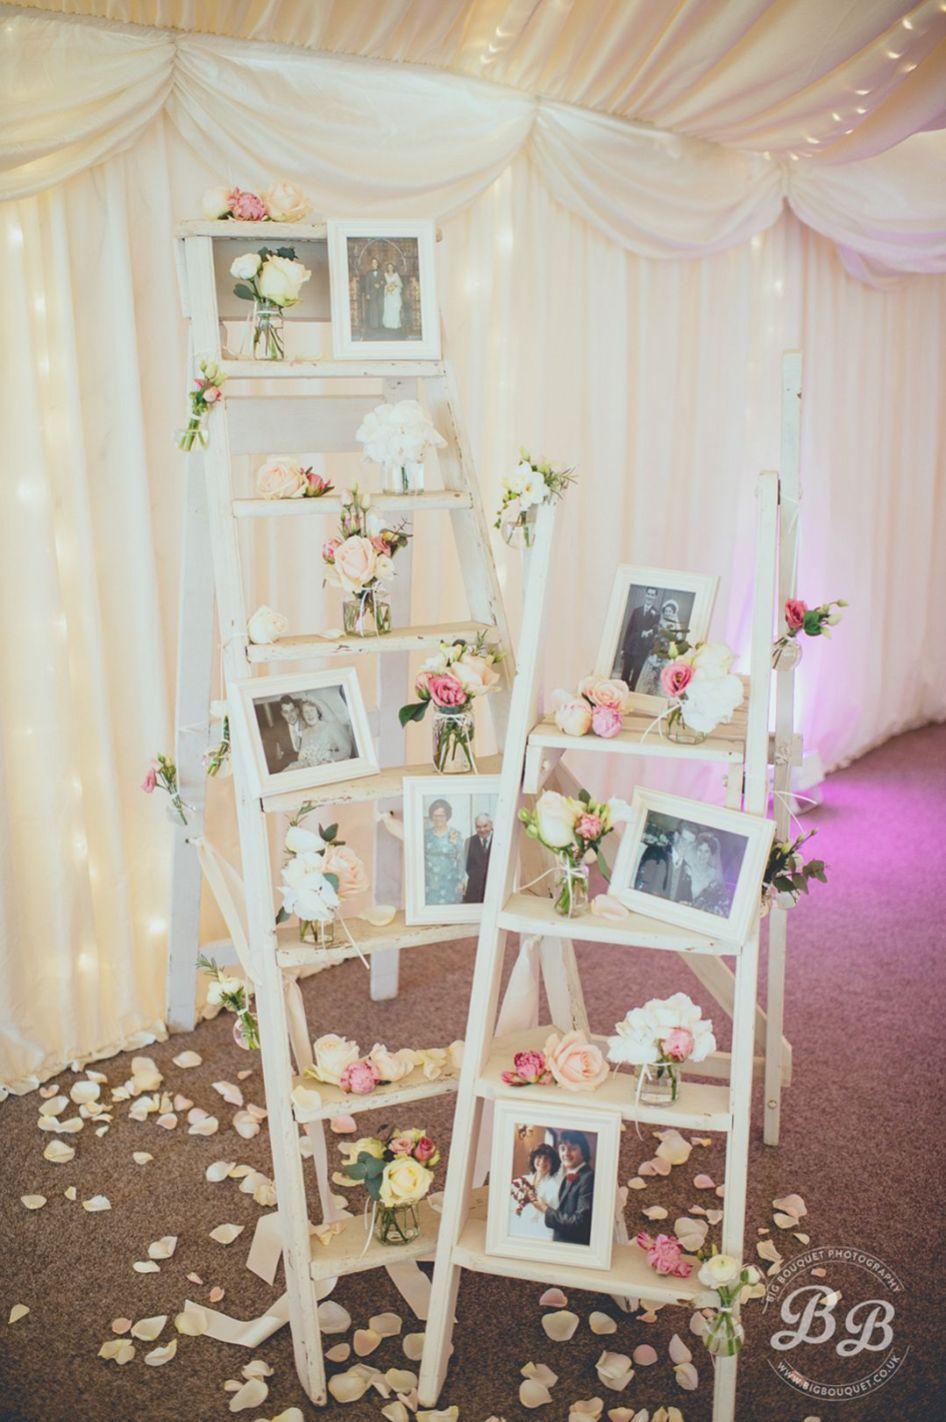 10 Marvelous DIY Rustic & Cheap Wedding Centerpieces Ideas ...